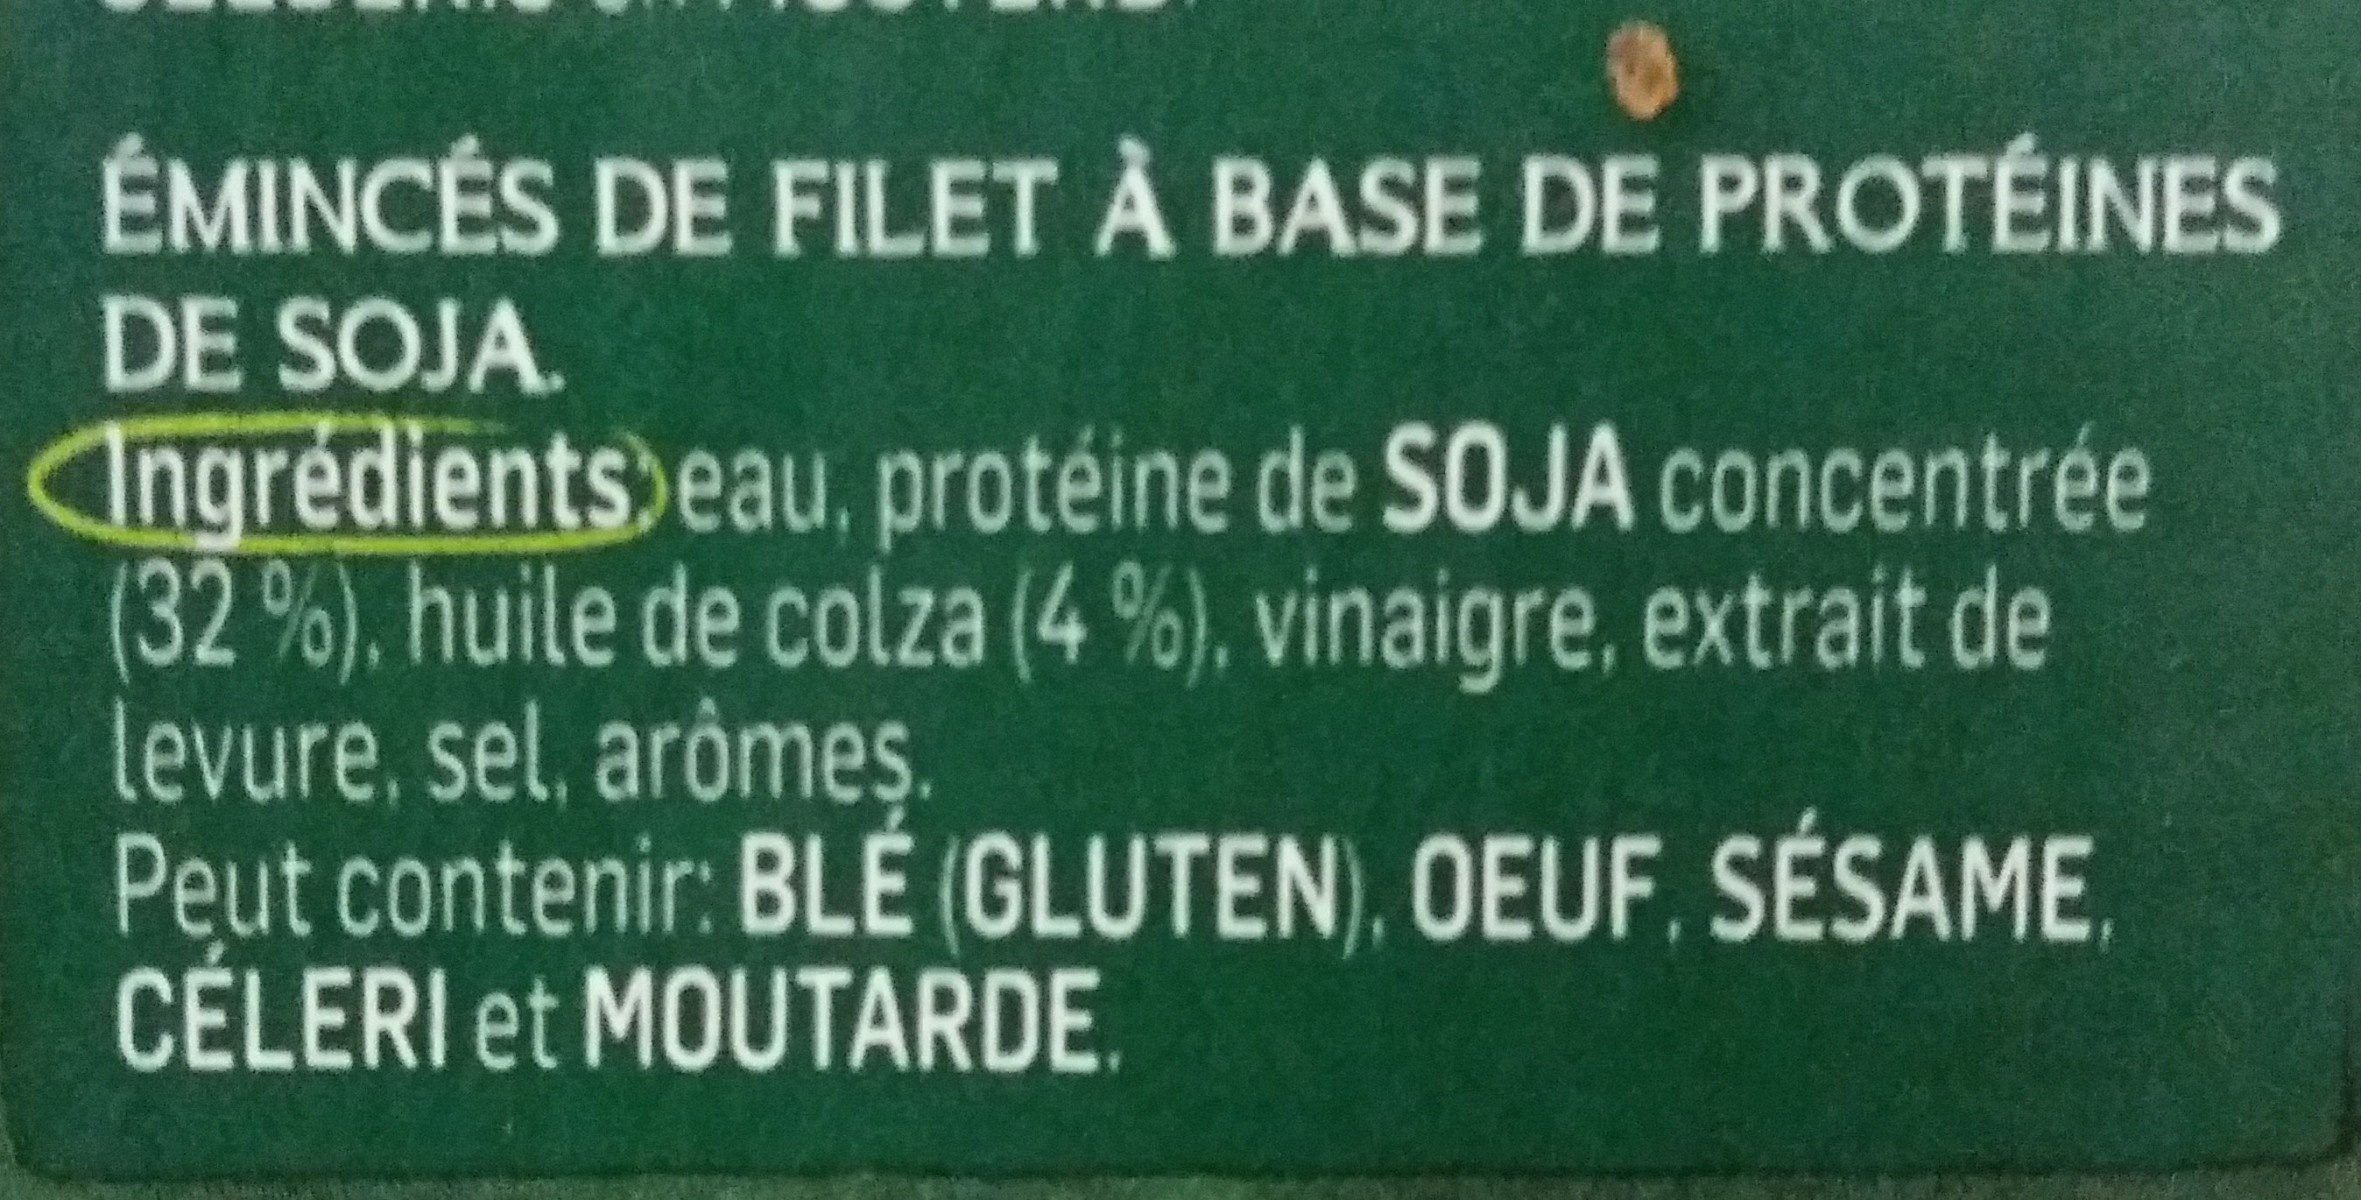 Émincés de filet chicken style - Ingrediënten - fr